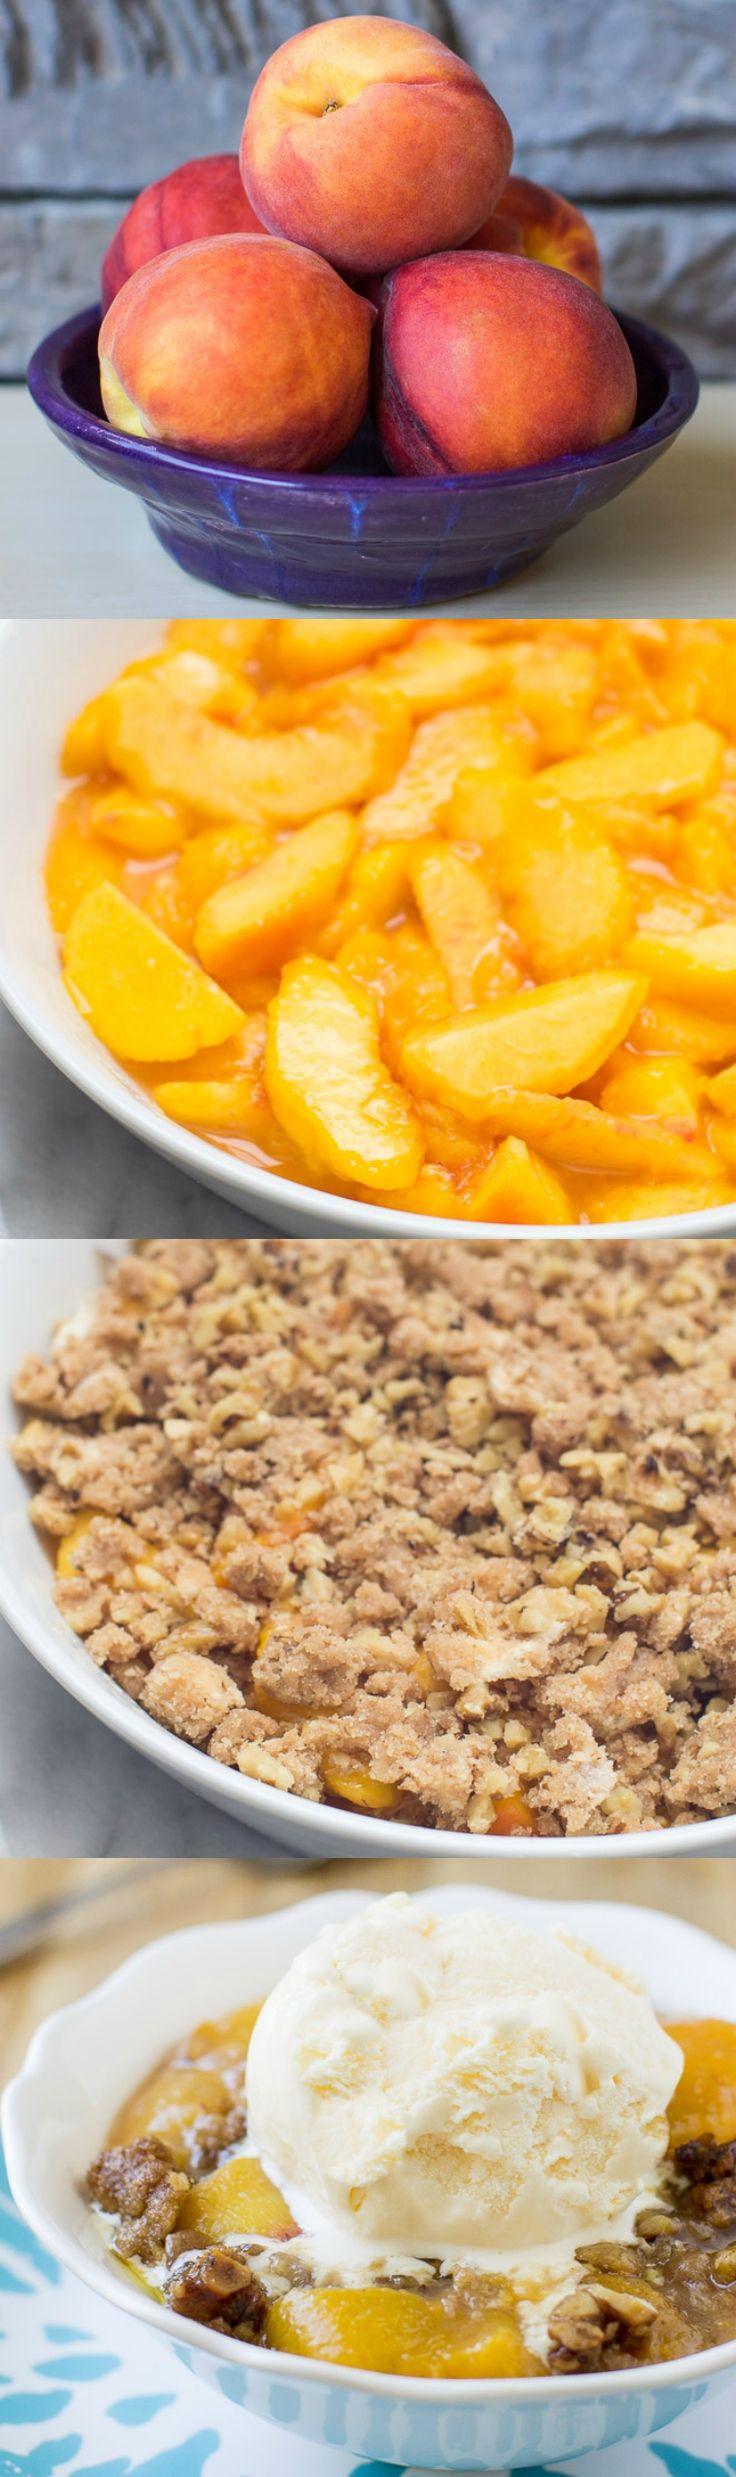 pumpkin oatmeal paleo